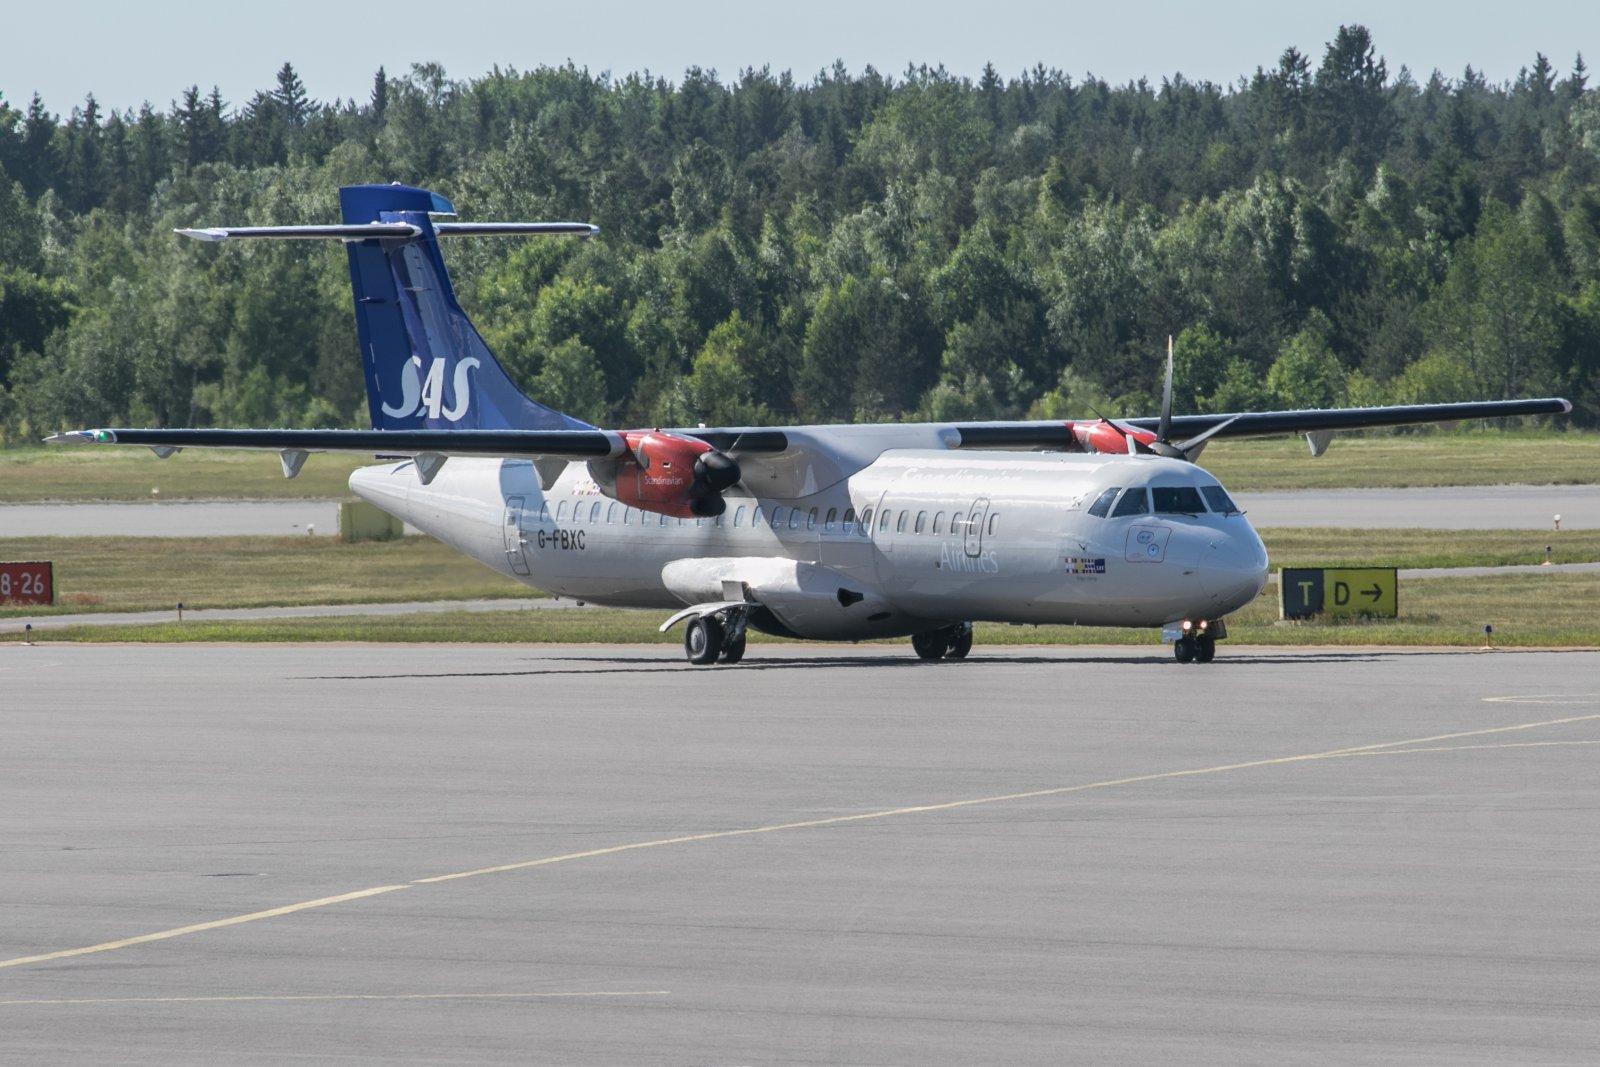 G-FBXC. 4.6  ATR 72-600